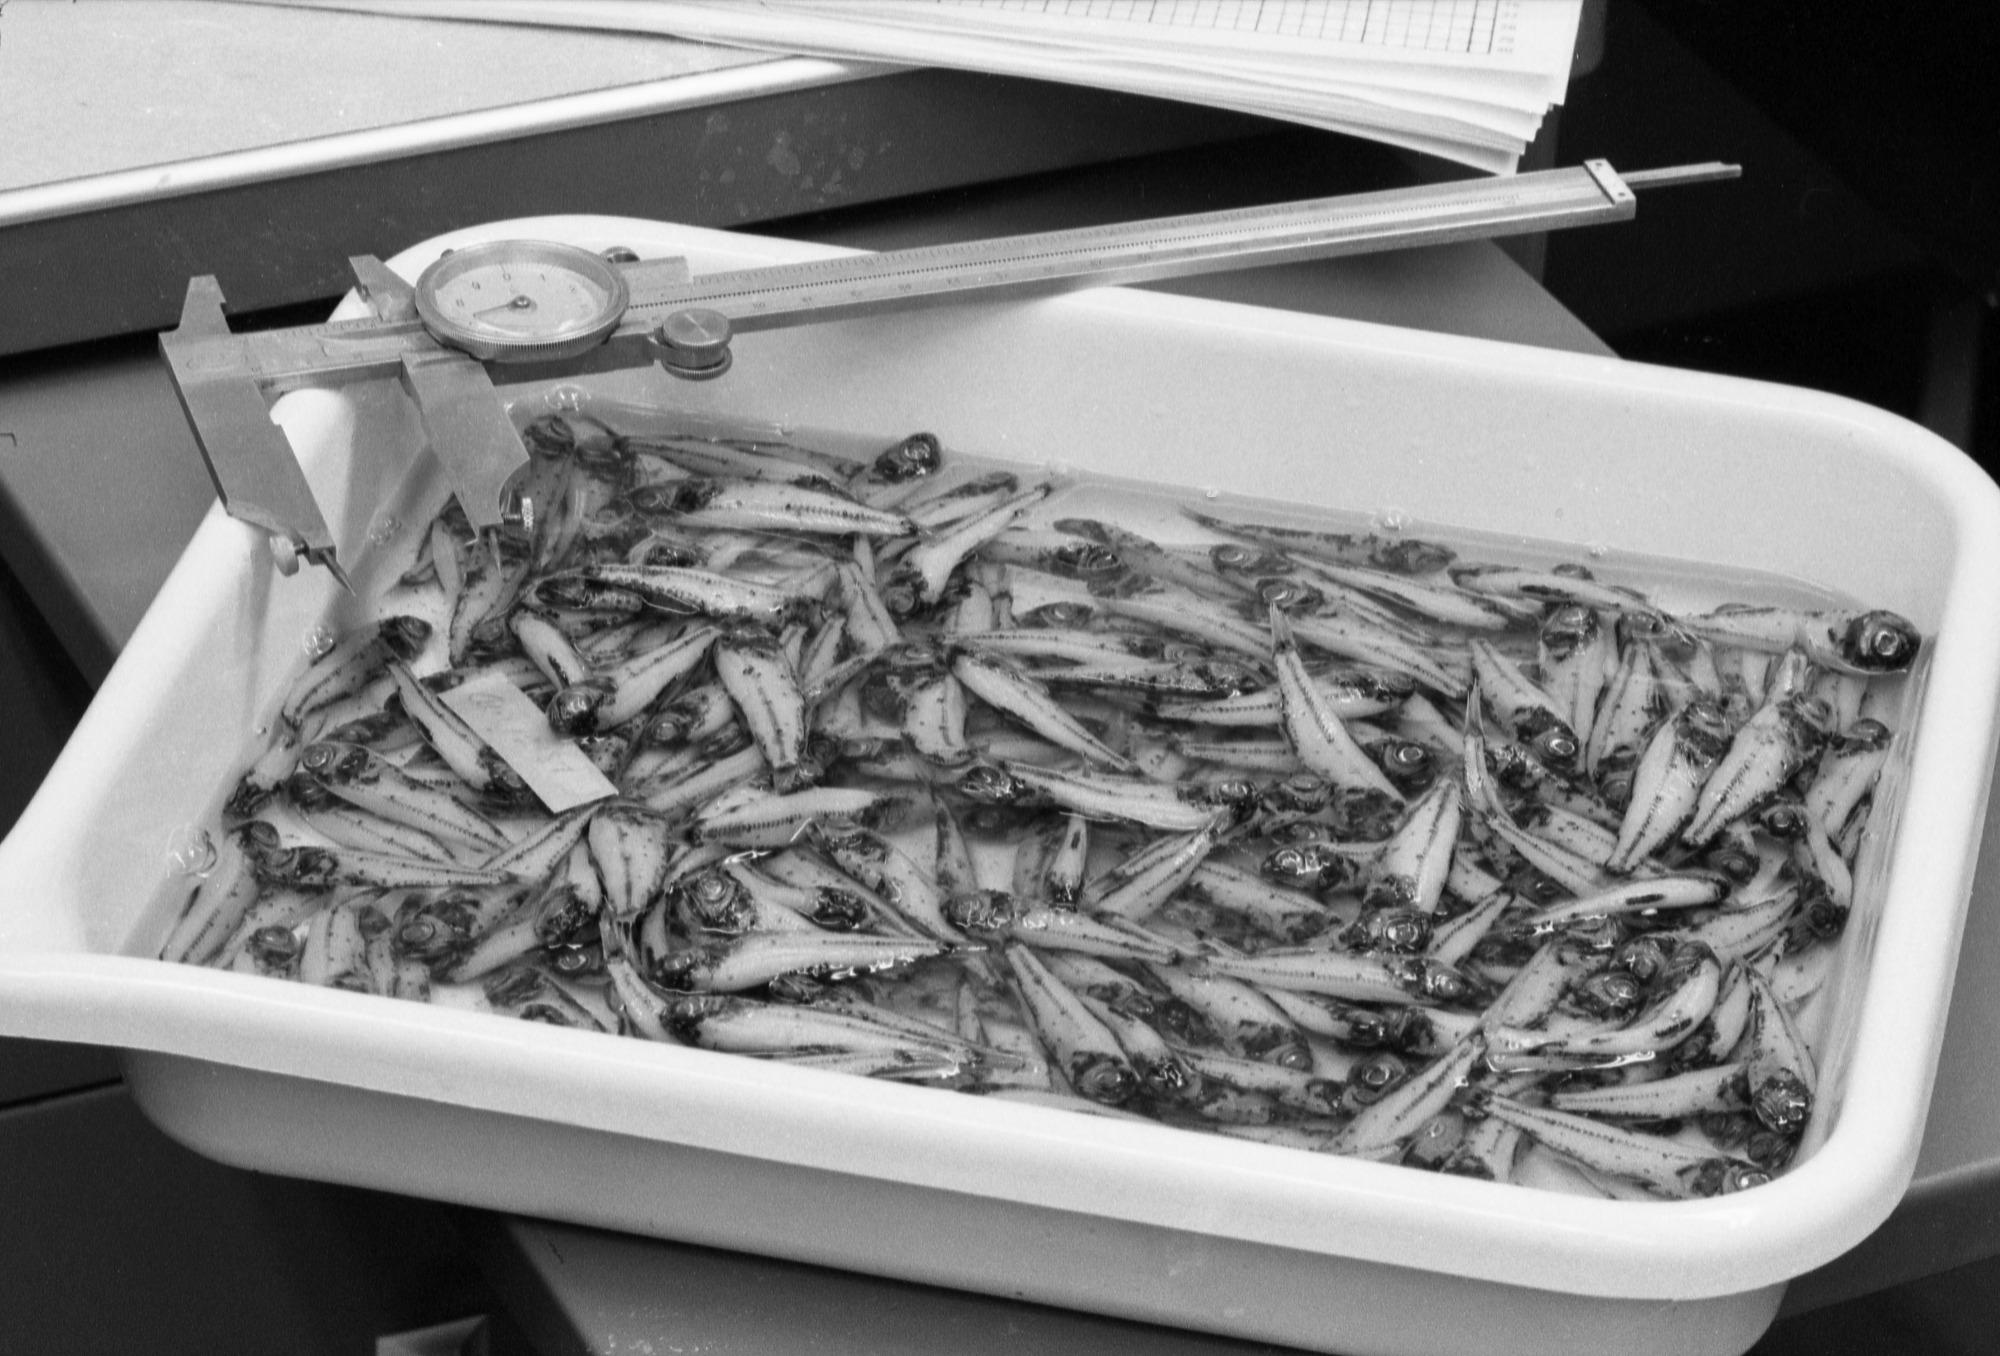 Study of Mercury Content in Fish